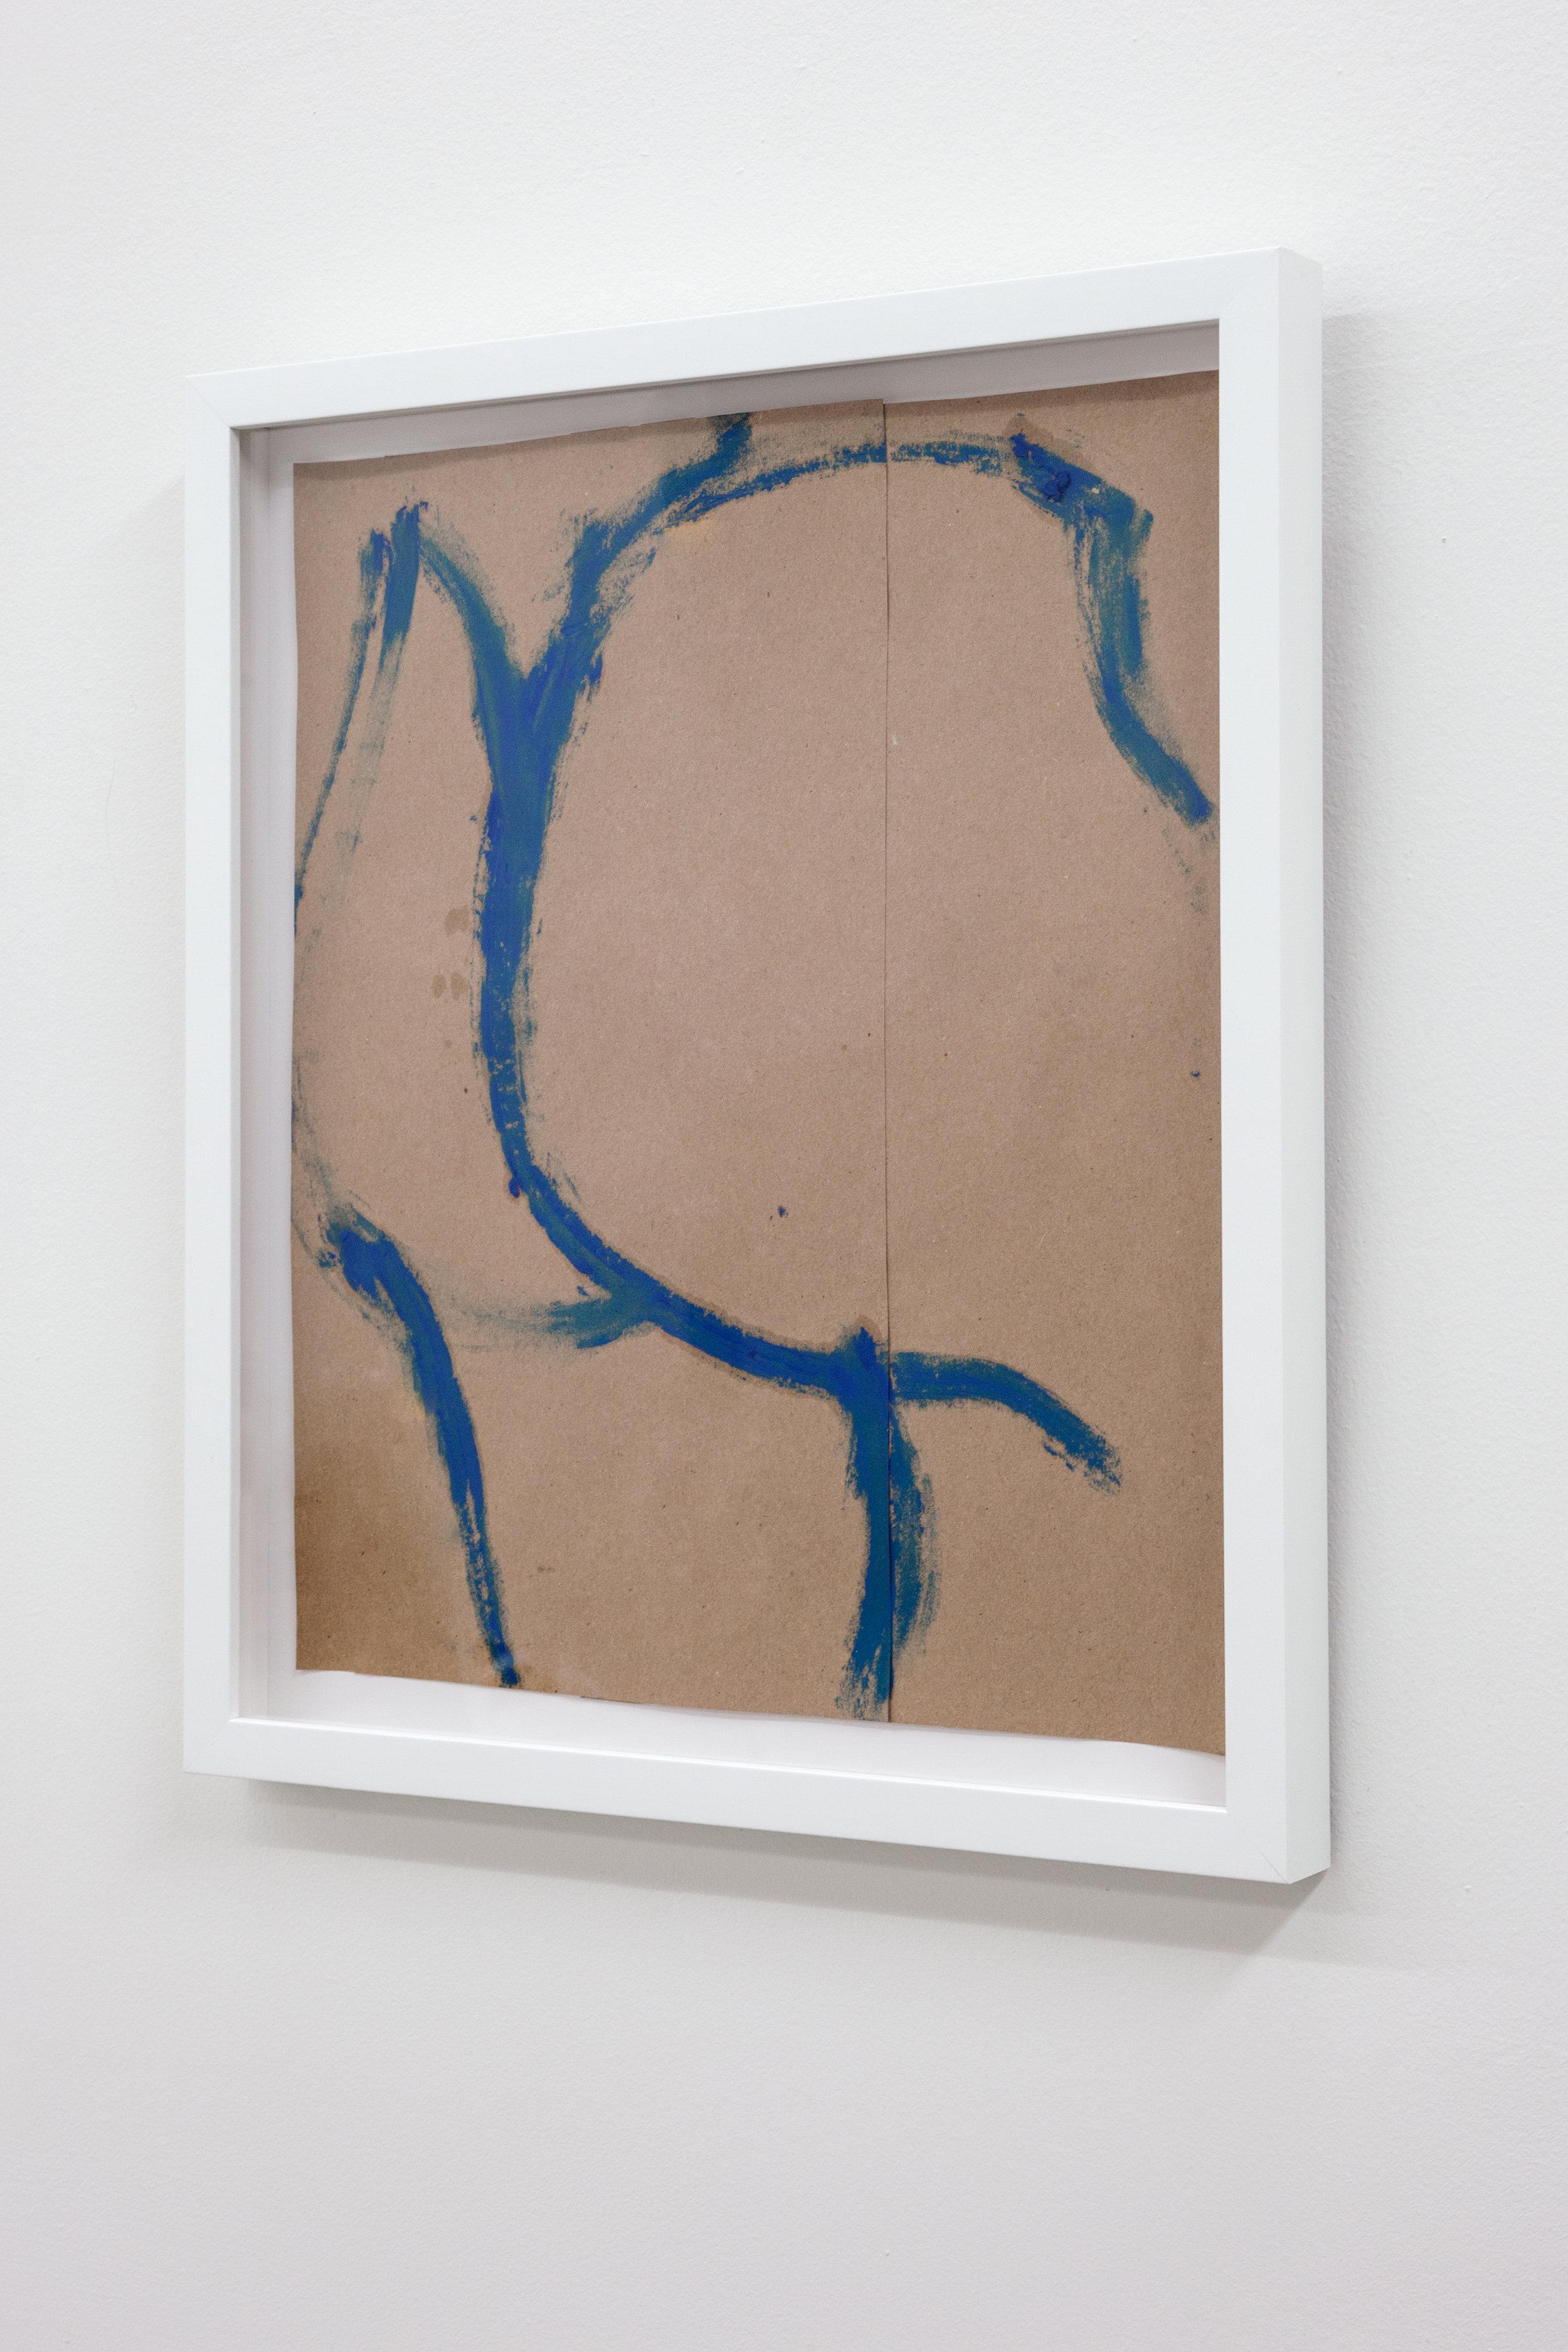 Omari Douglin,  Untitled (Butt Drawing) , 2019, Oil Pastel on Paper, 15.75x13in